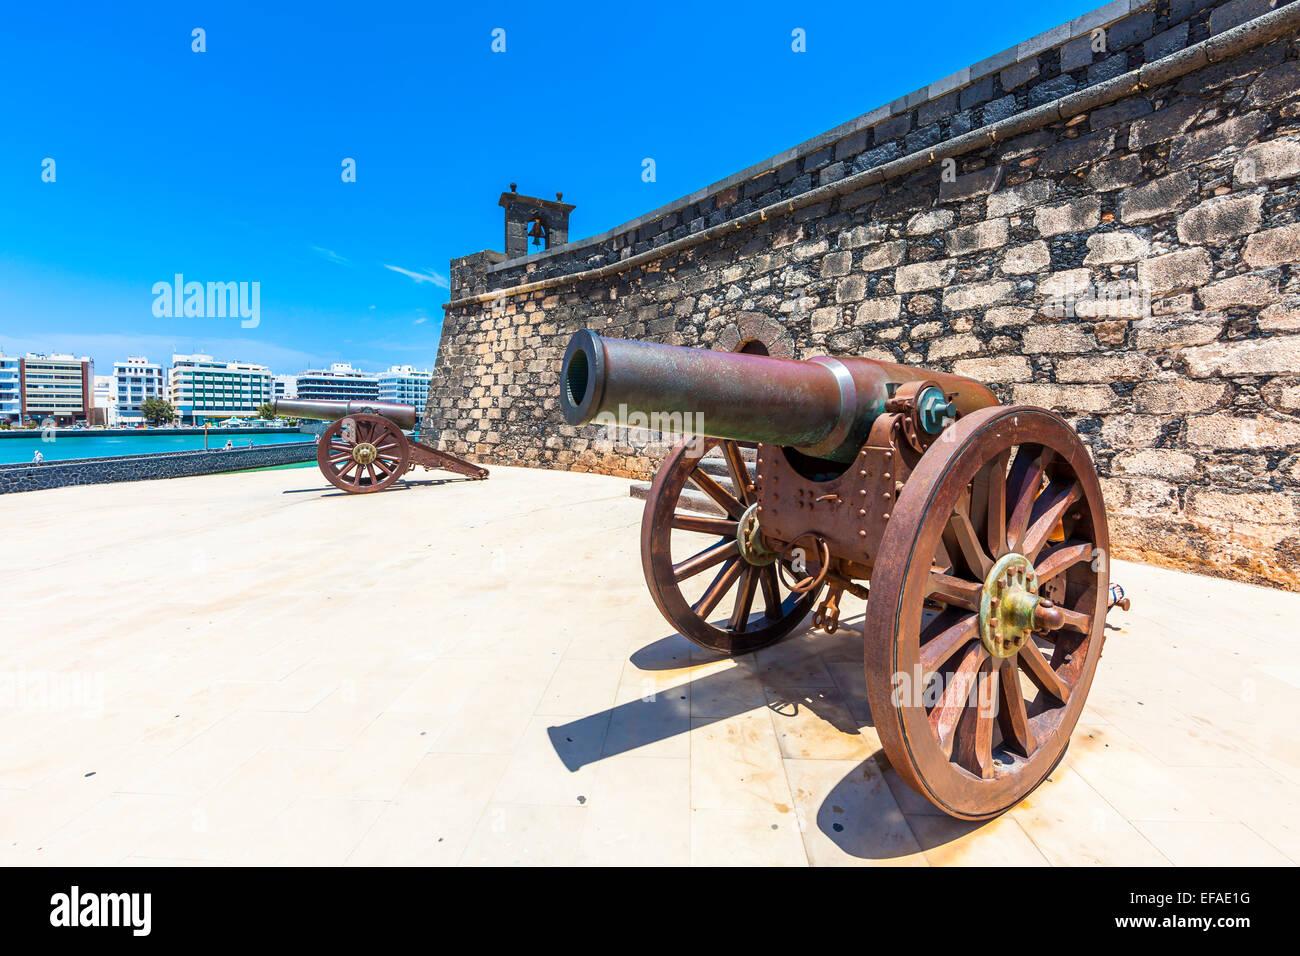 Old cannon outside the castle Castillo de San Gabriel, Arrecife, Lanzarote, Canary Islands, Spain Stock Photo